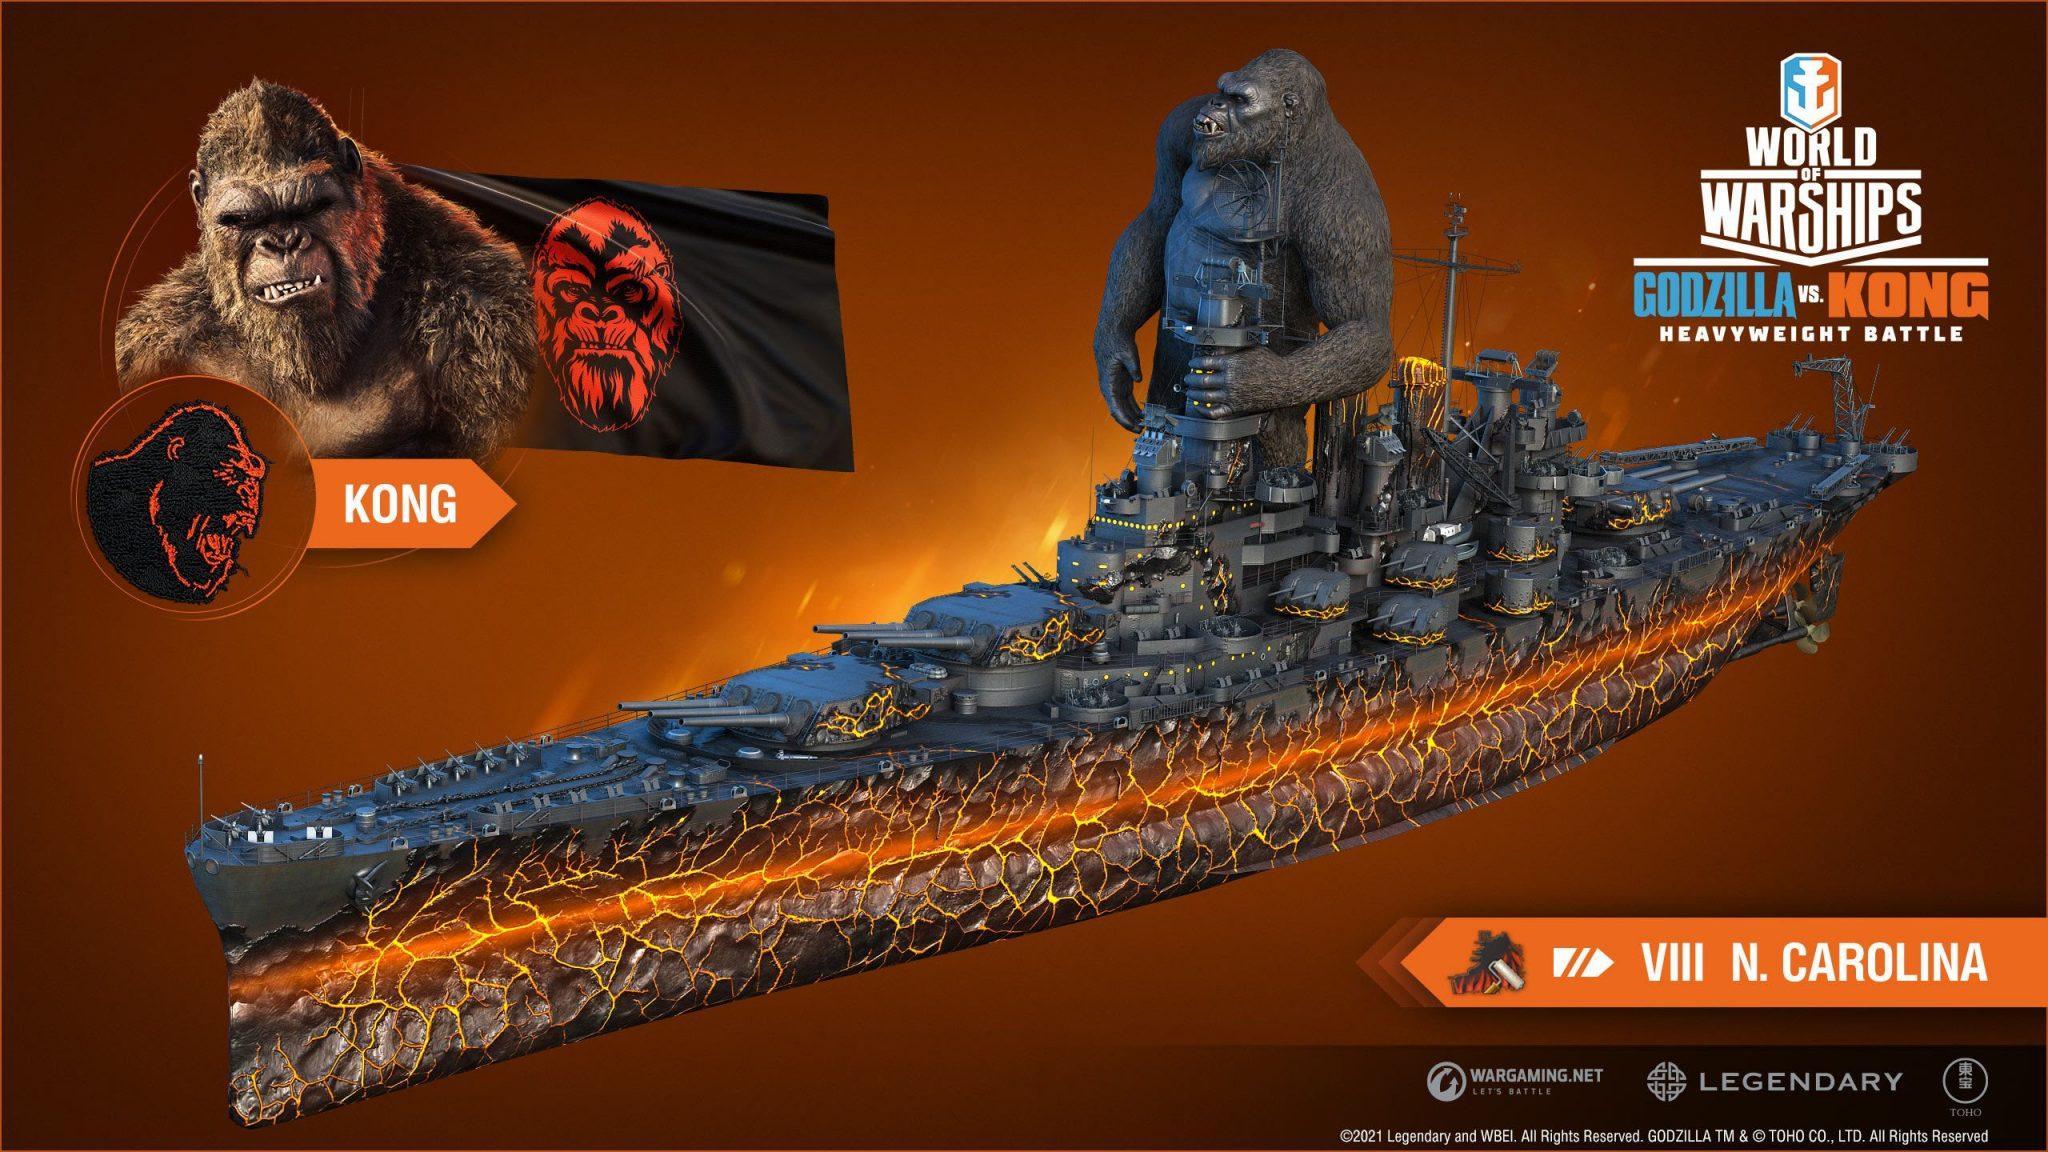 World of Warships 242021 2